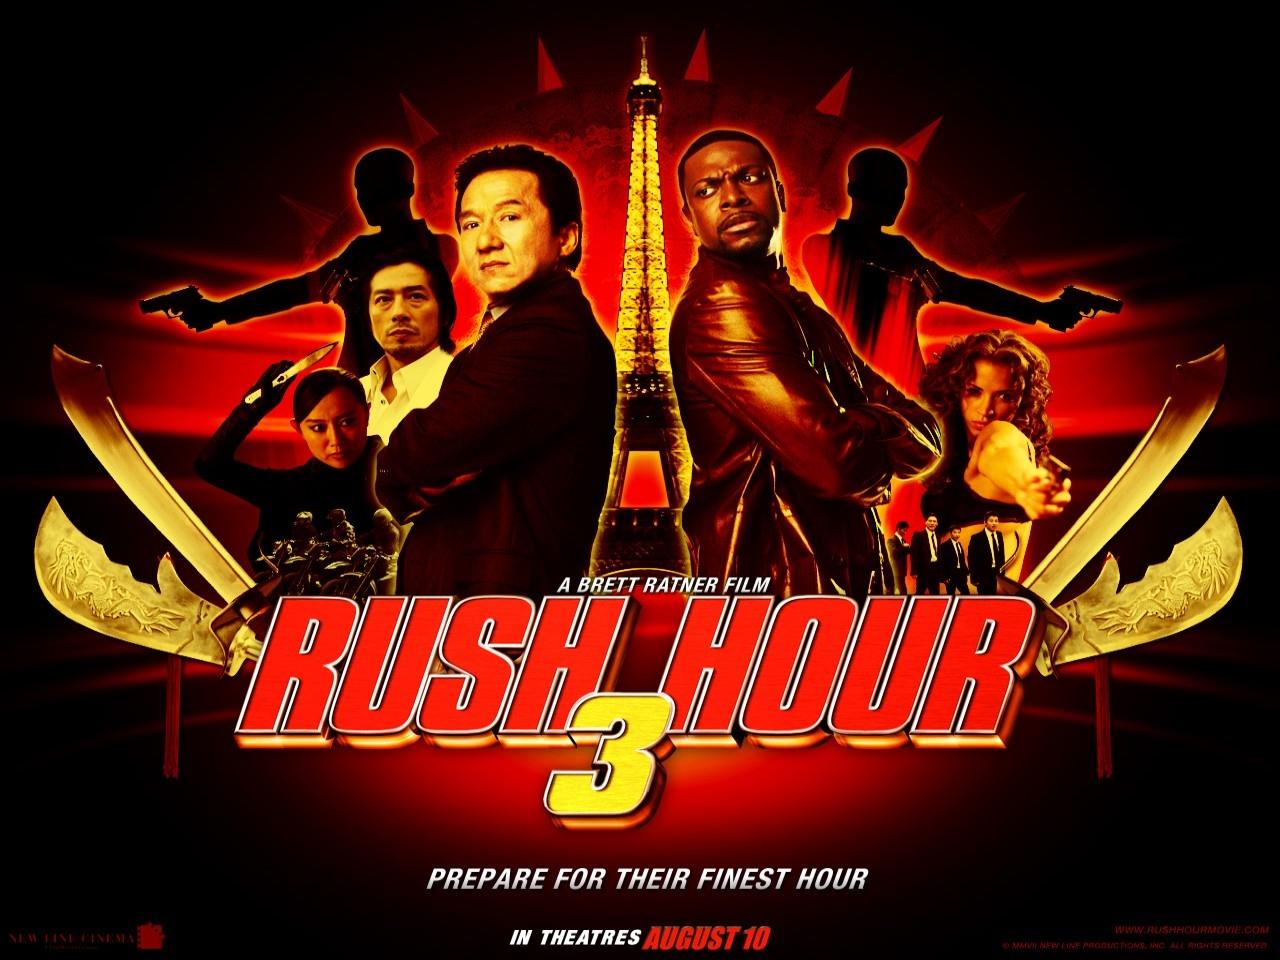 Wallpaper del film Rush Hour 3 con Chris Tucker e Jackie Chan